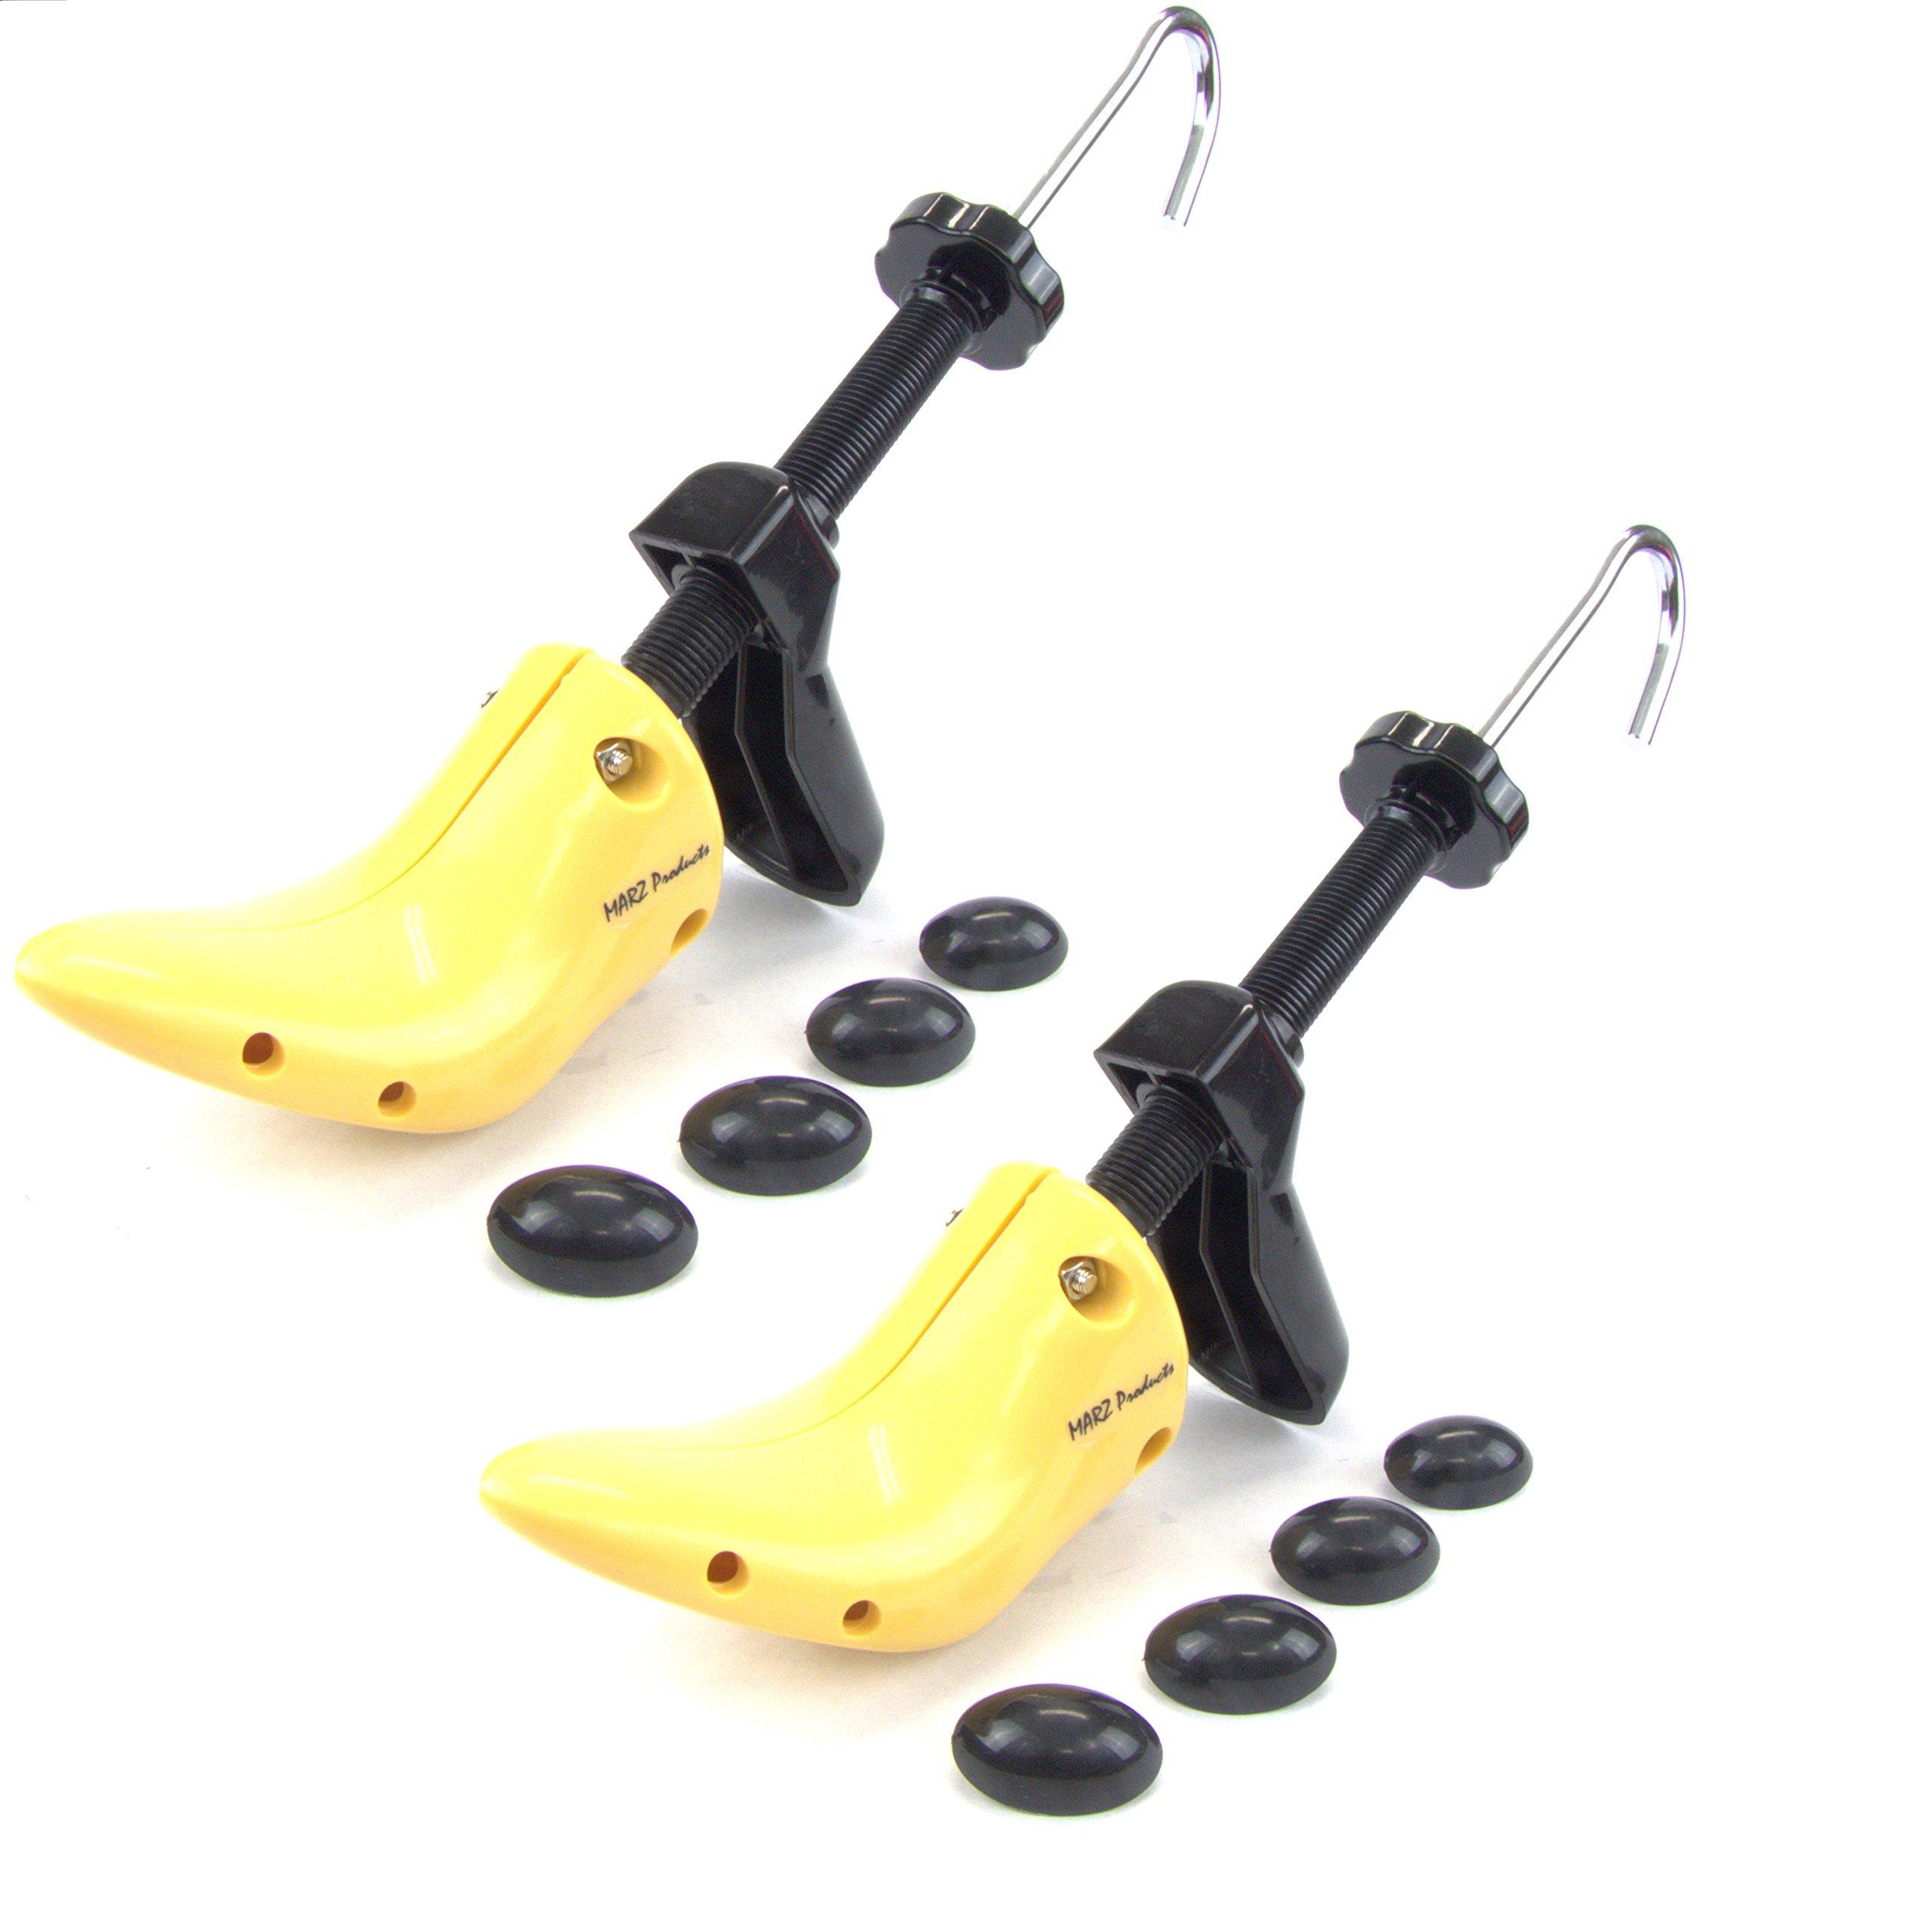 MARZ Products Ladies' High Heel 2-Way Plastic Shoe Stretcher Shaper, Size 5-10 B M US, Yellow & Black PAIR